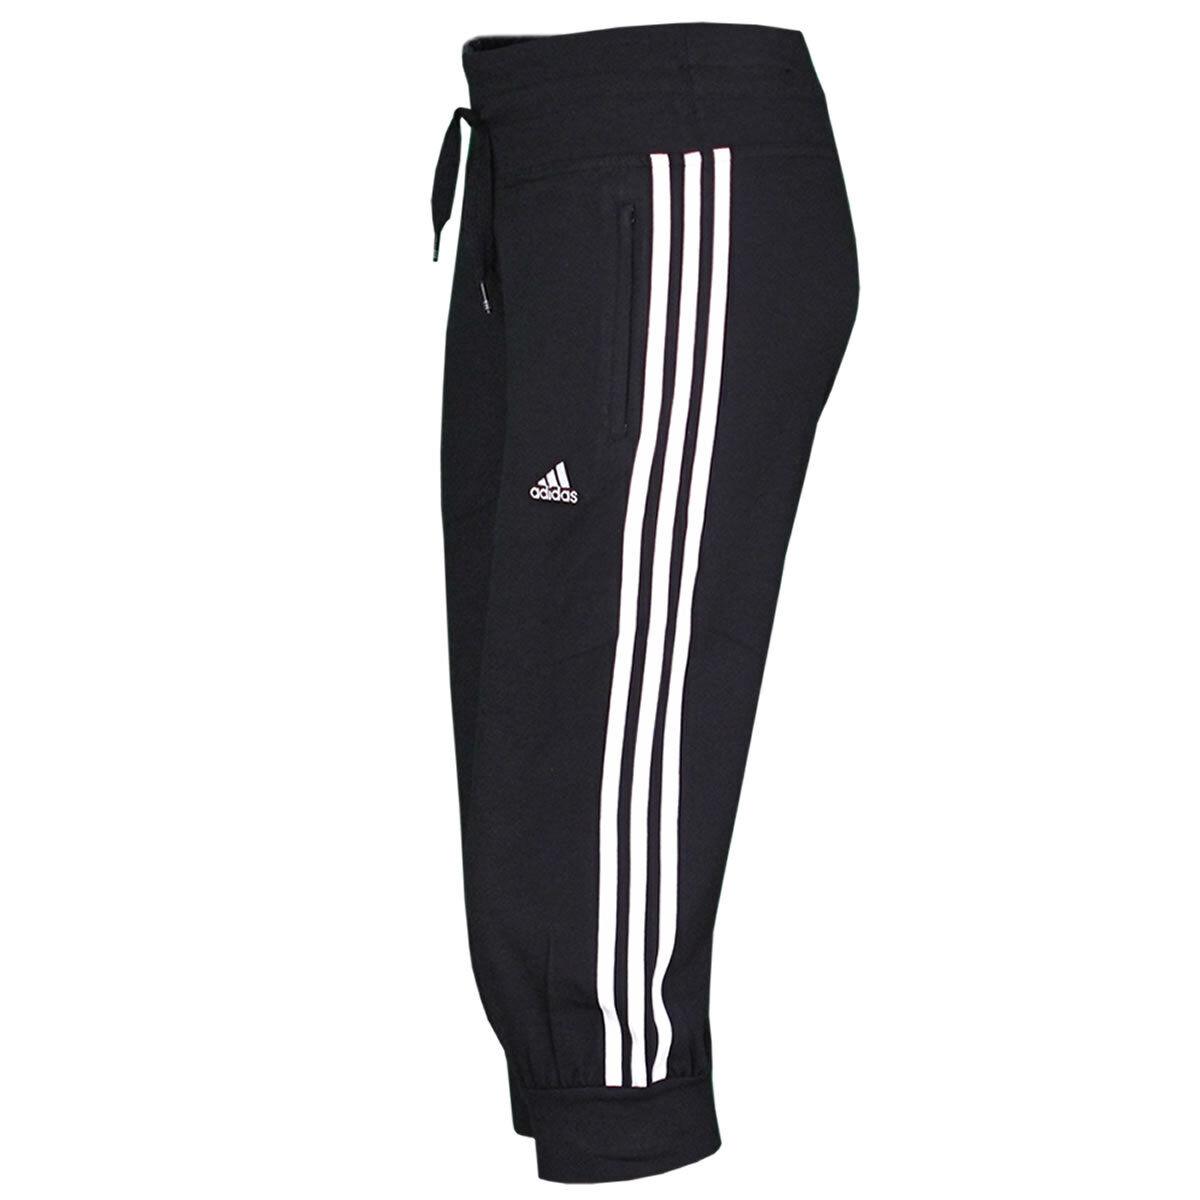 Adidas DaSie 3 4 Hose 3-Streifen Capri Pant Freizeithose schwarz-weiß NEU